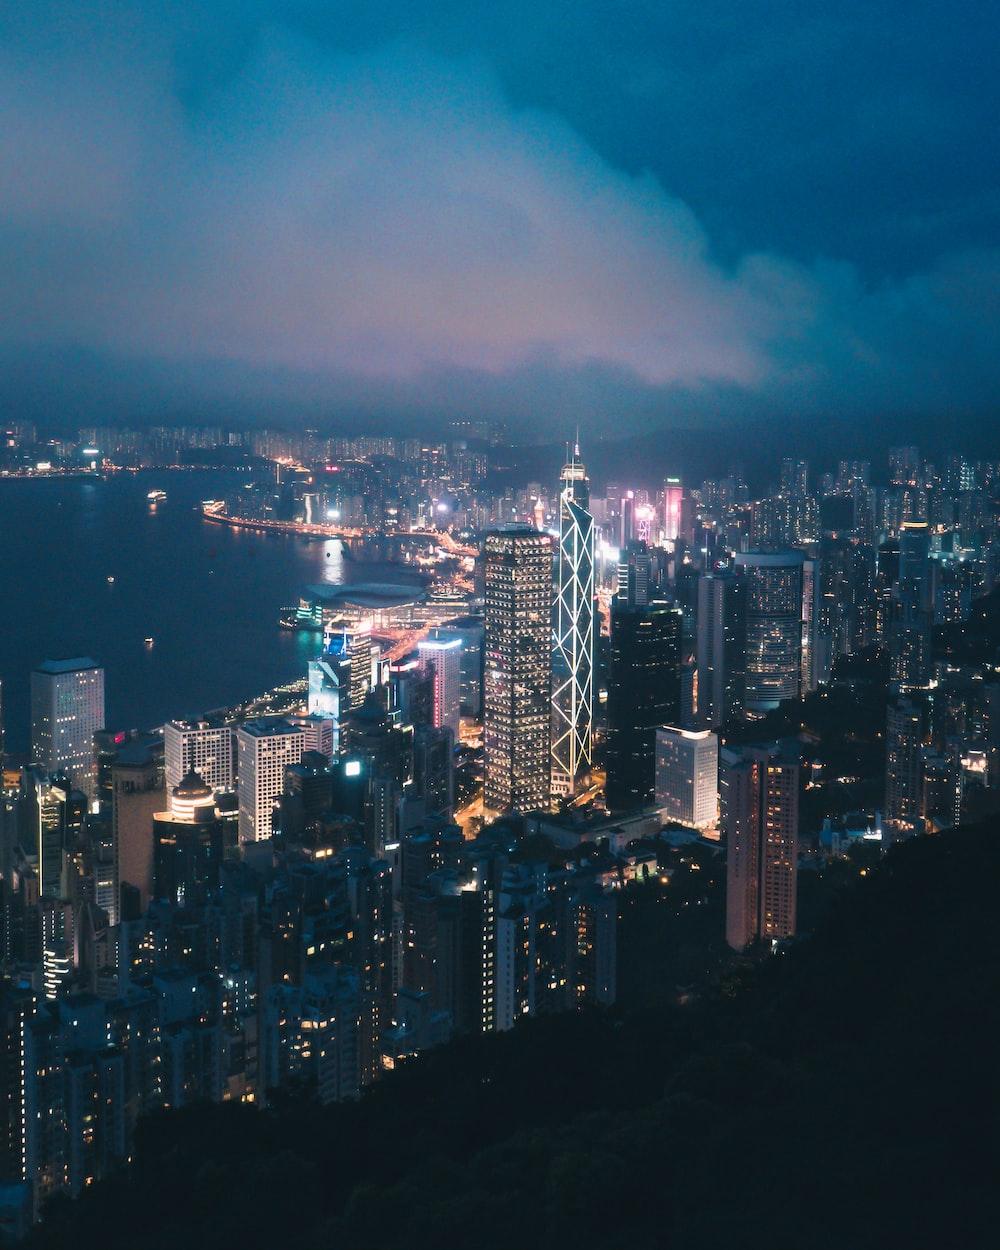 aerial shot of city skyline at night